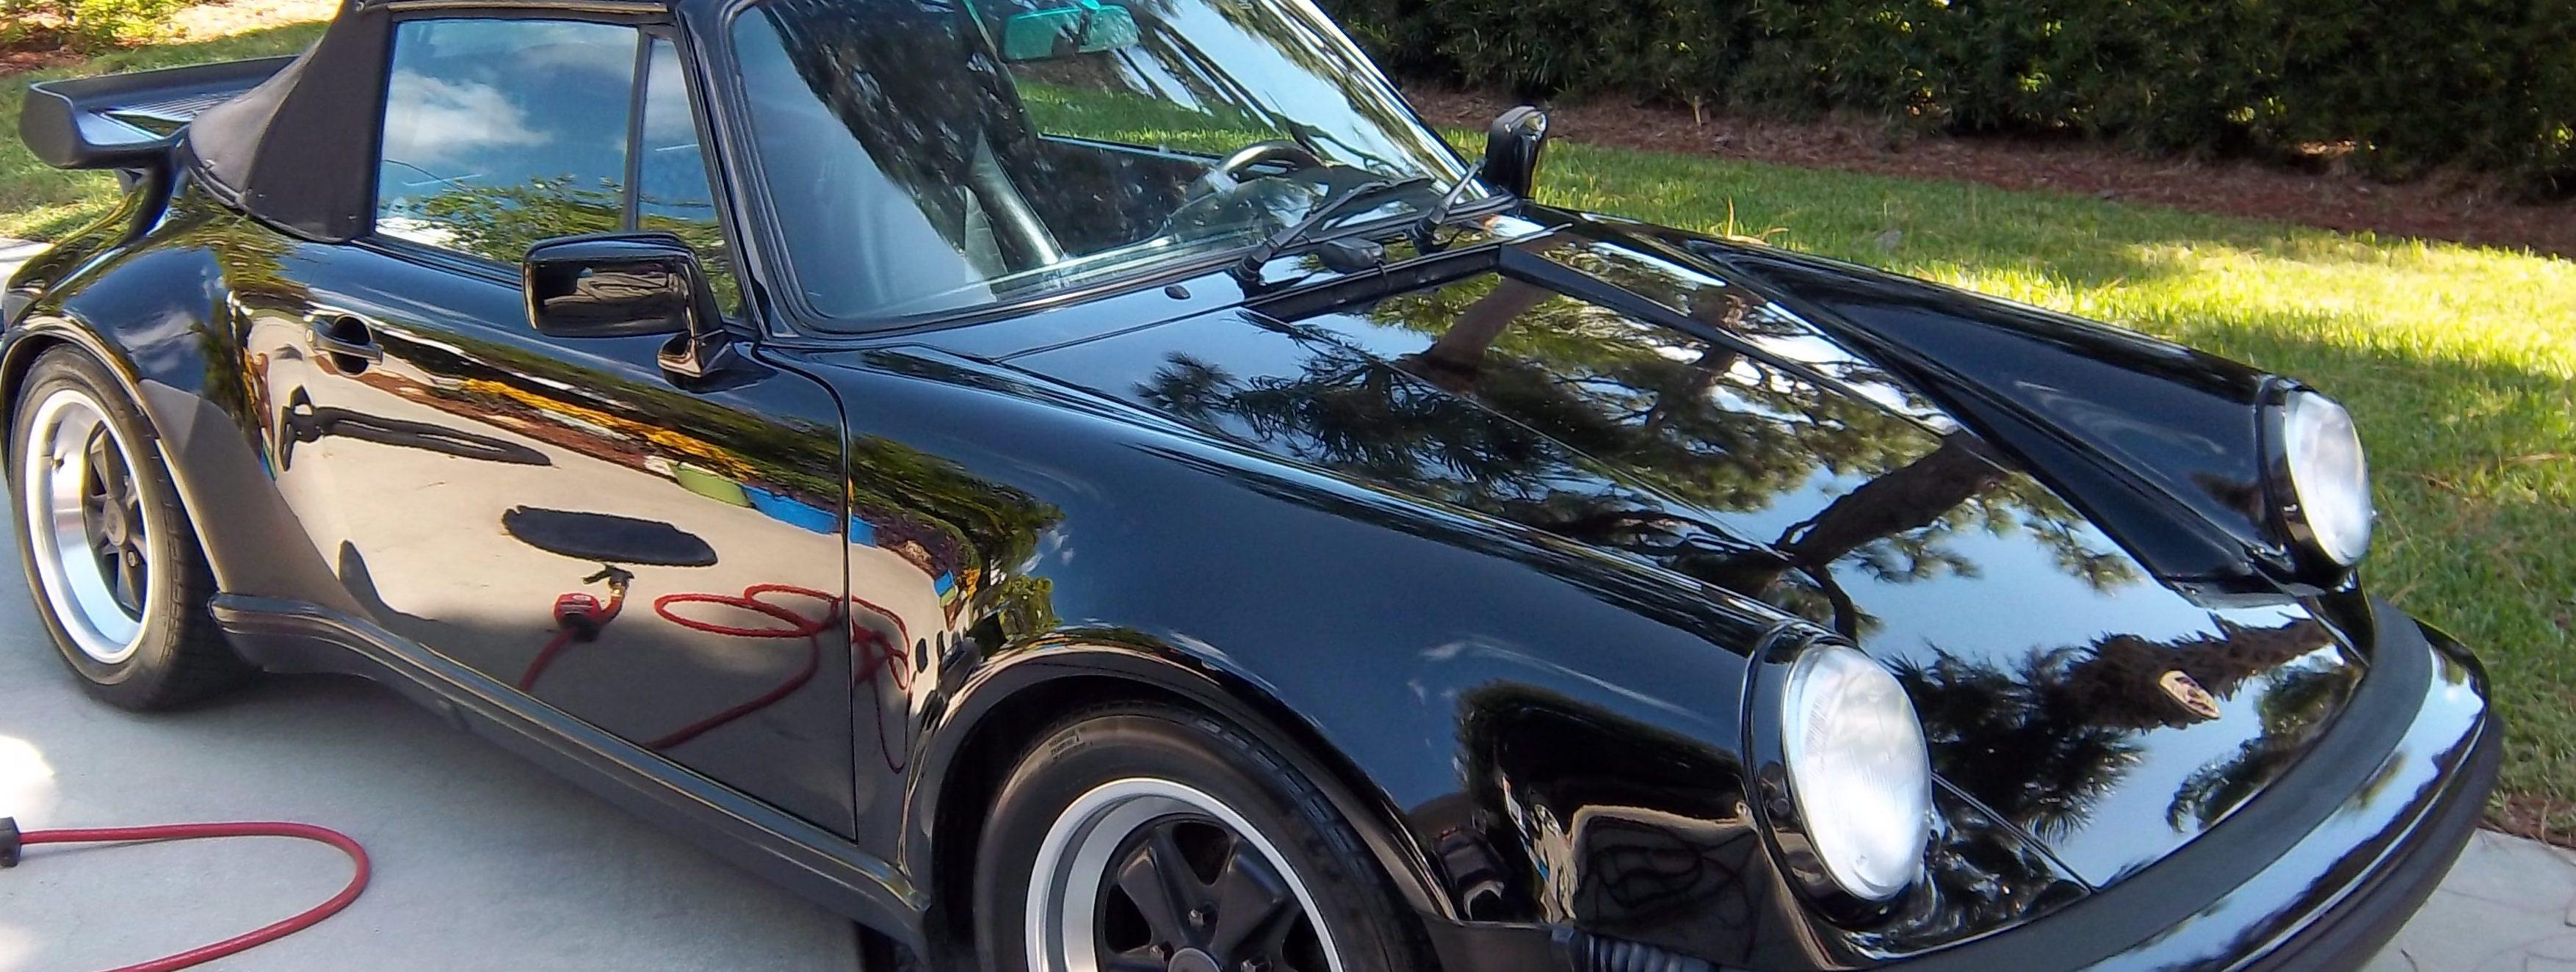 Tampa Auto Detailing | Go Mobile